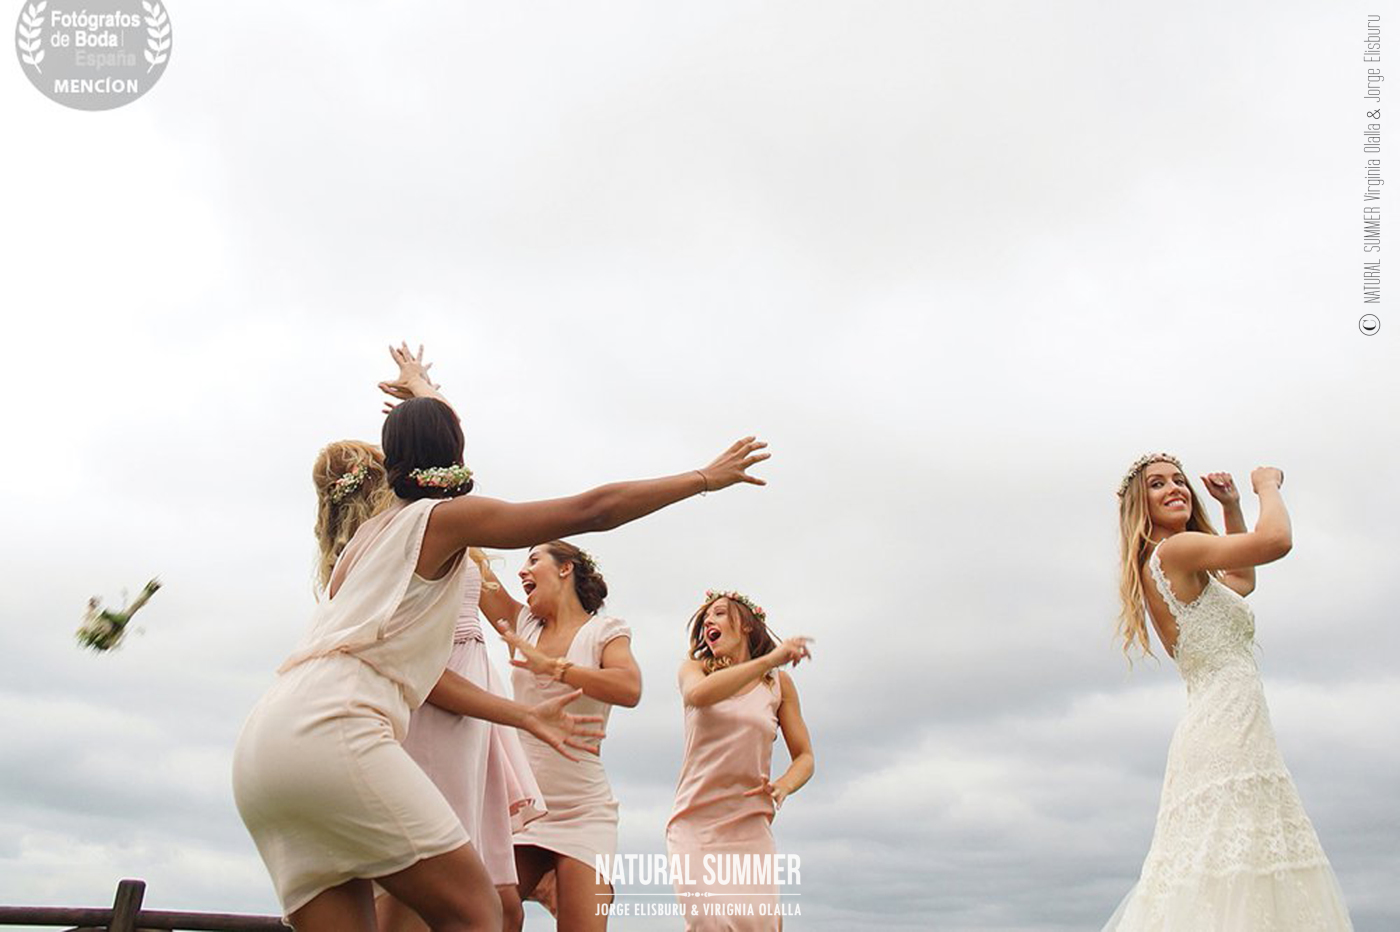 fotografo de boda Jorge Elisburu (Natural Summer)